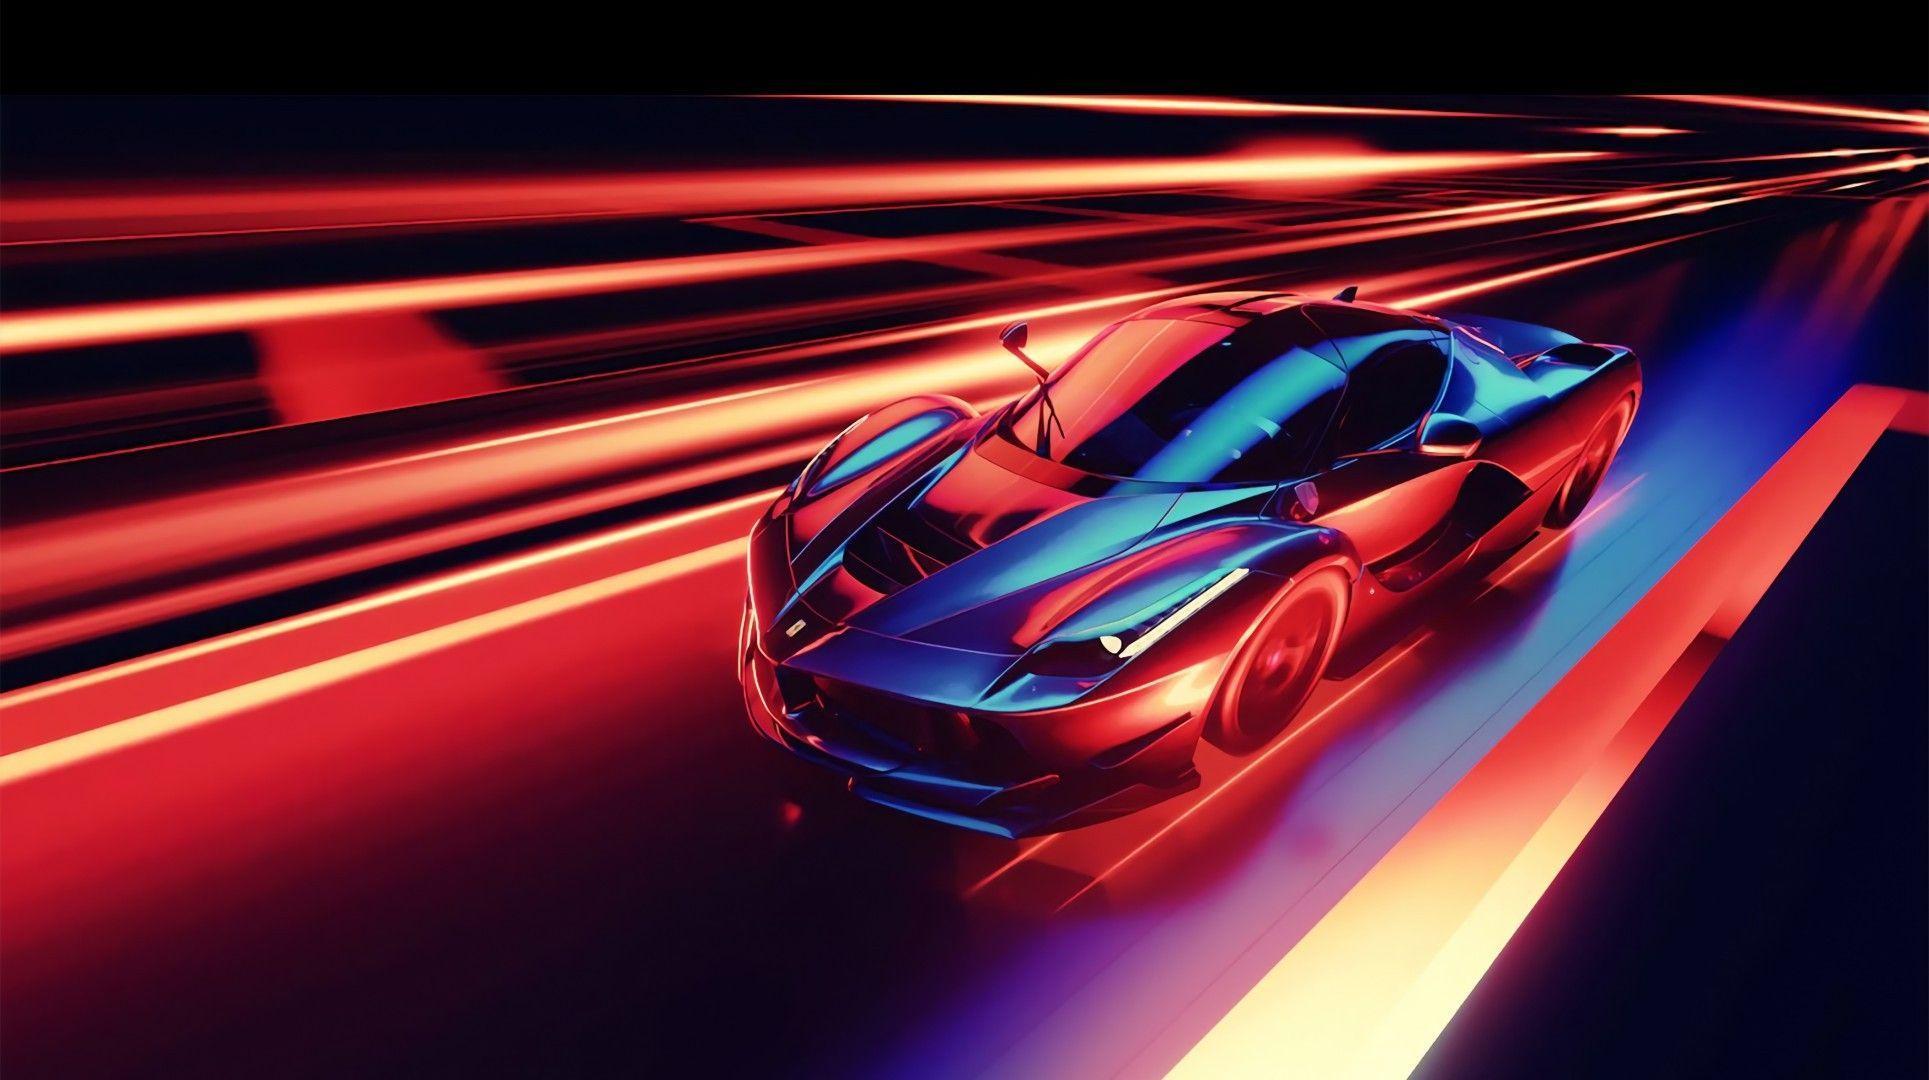 Neon Ferrari Wallpapers Top Free Neon Ferrari Backgrounds Wallpaperaccess